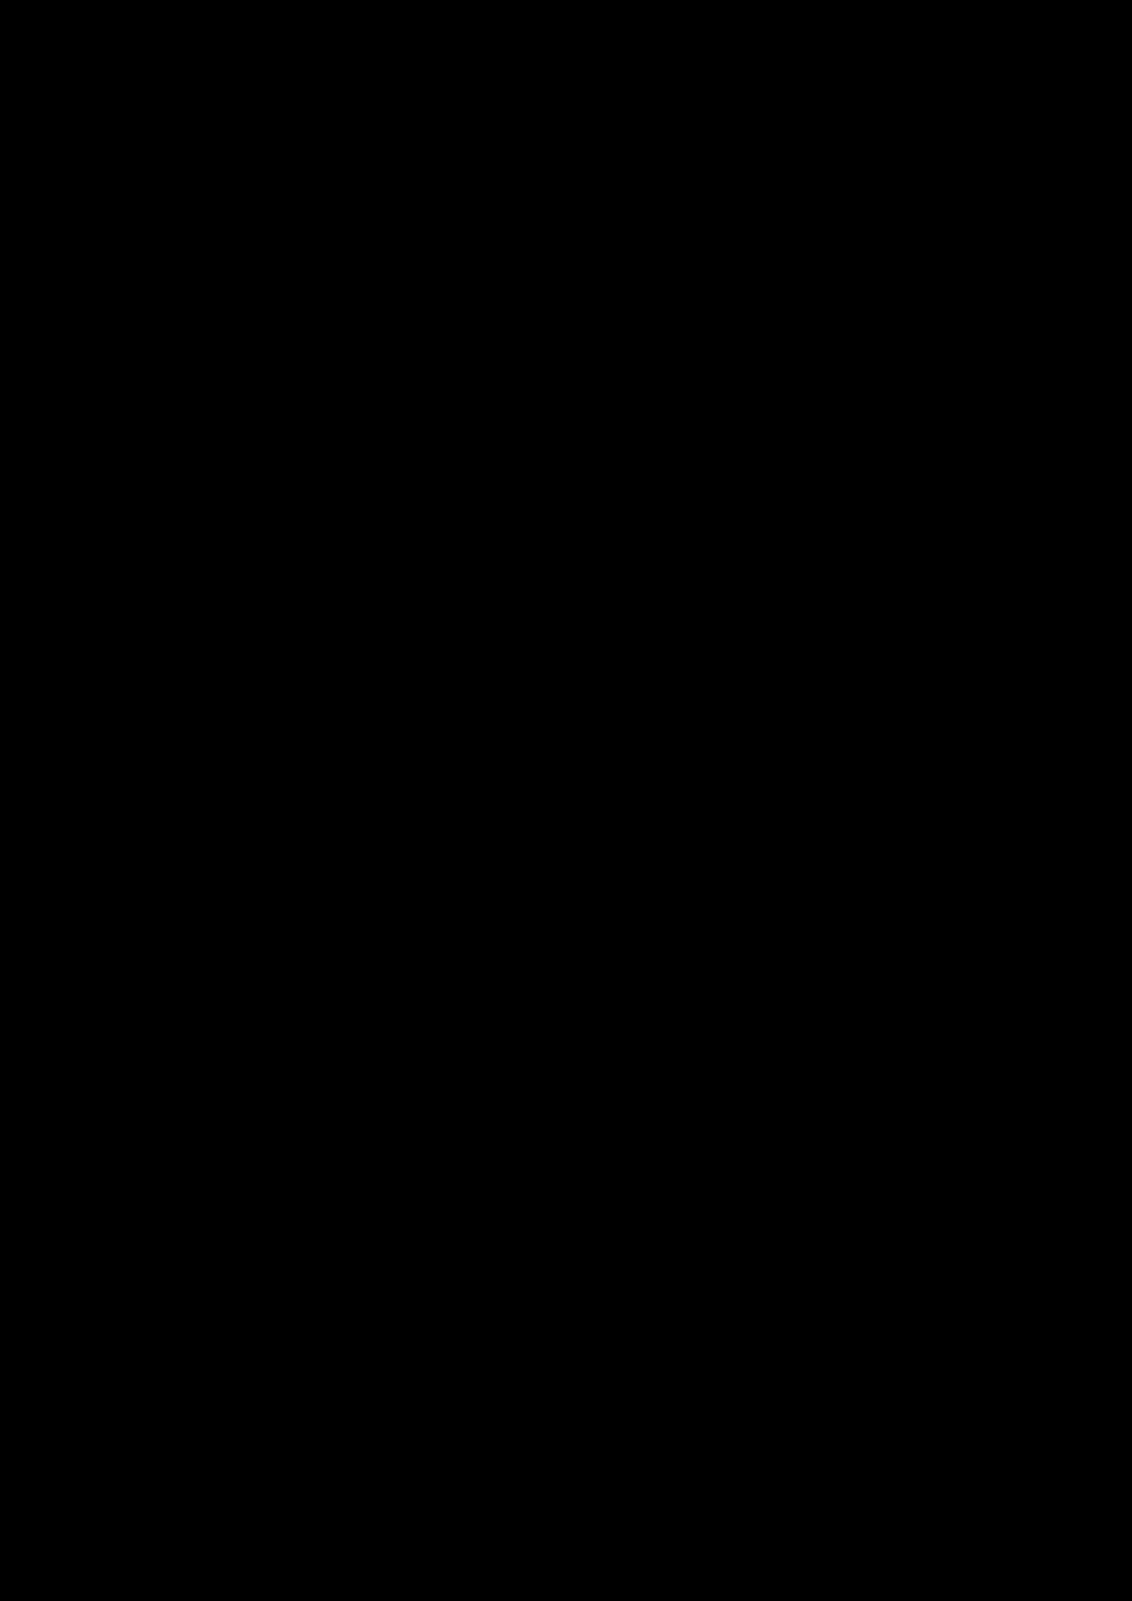 Ispoved Pervogo Boga slide, Image 18